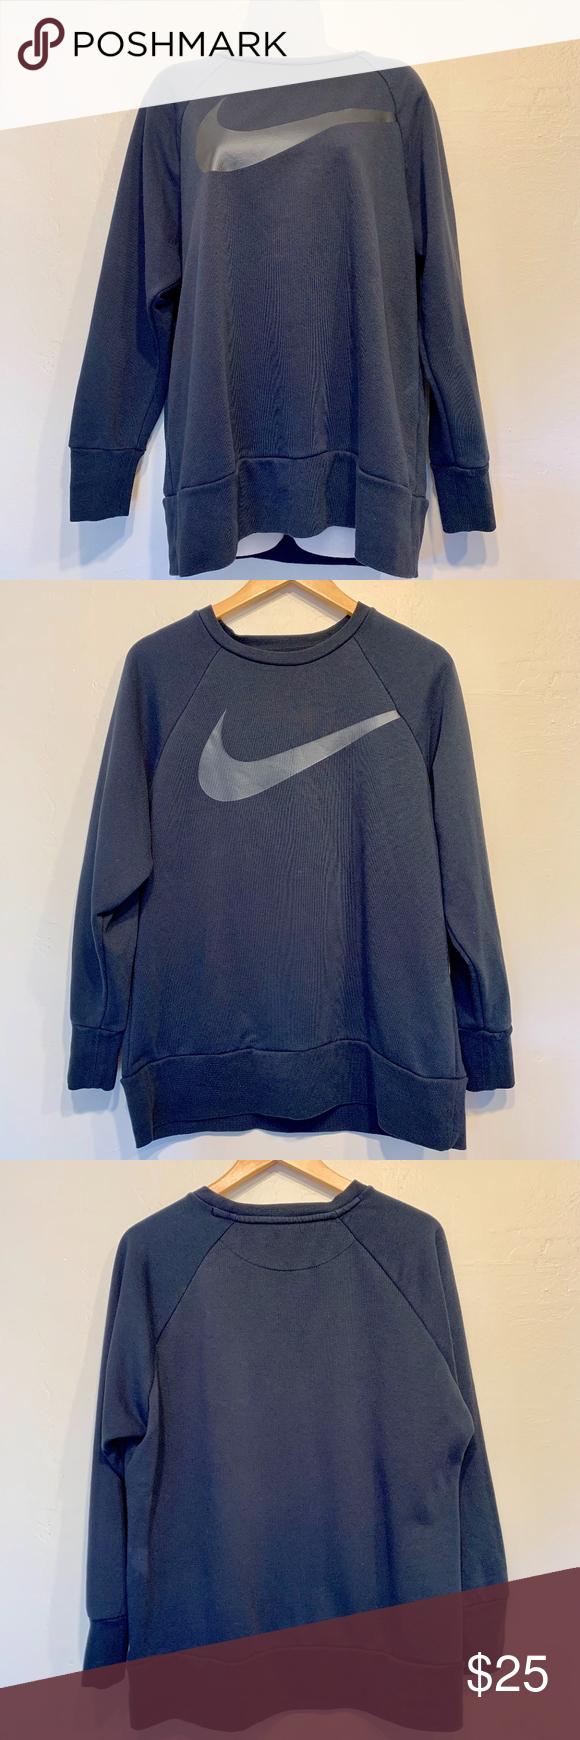 Nike Dri Fit Unisex Athletic Swoosh Sweatshirt Clothes Design Nike Dri Fit Running Sweatshirt [ 1740 x 580 Pixel ]